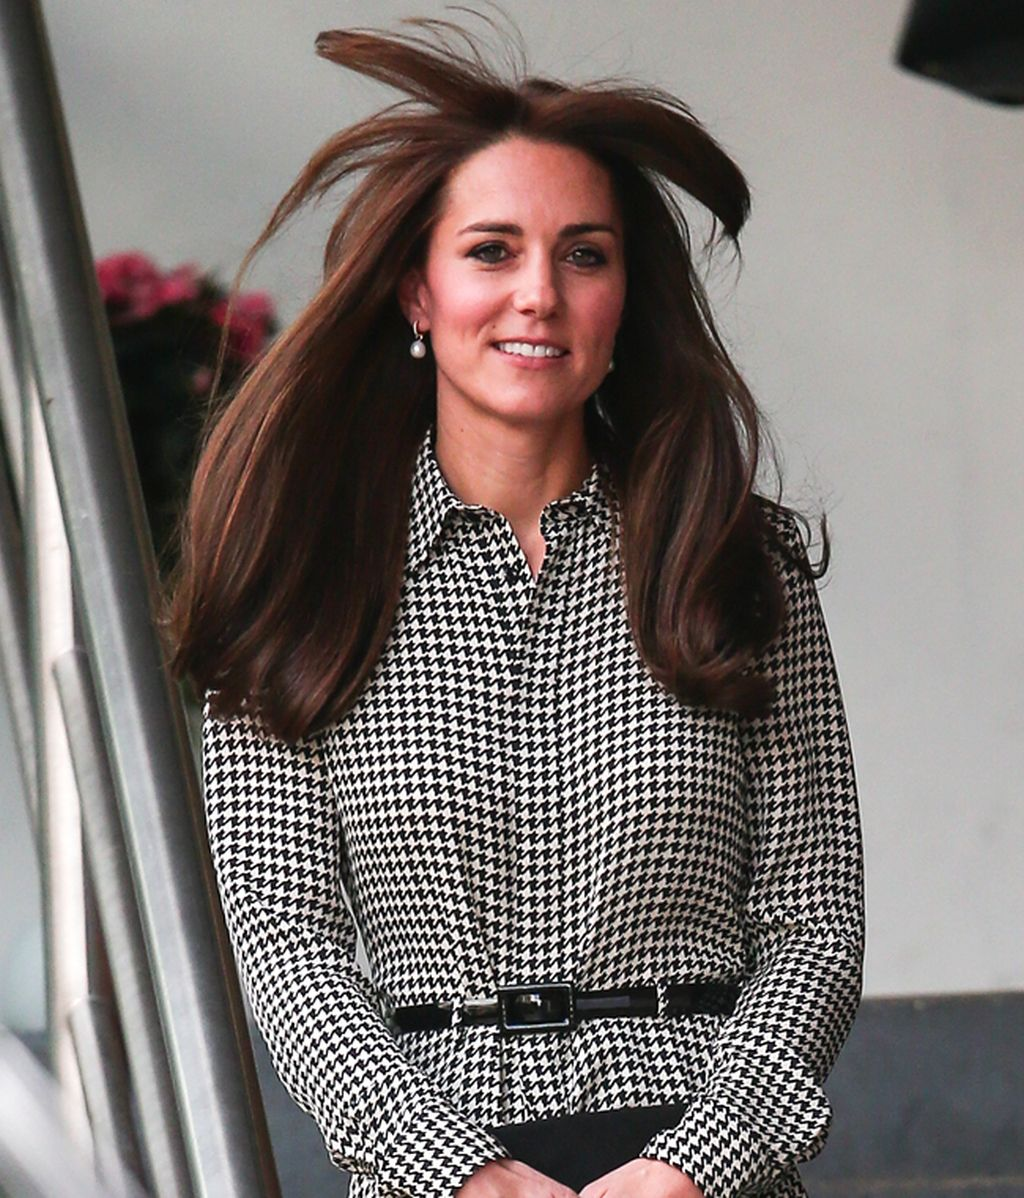 El pelo palmera de Kate Middleton